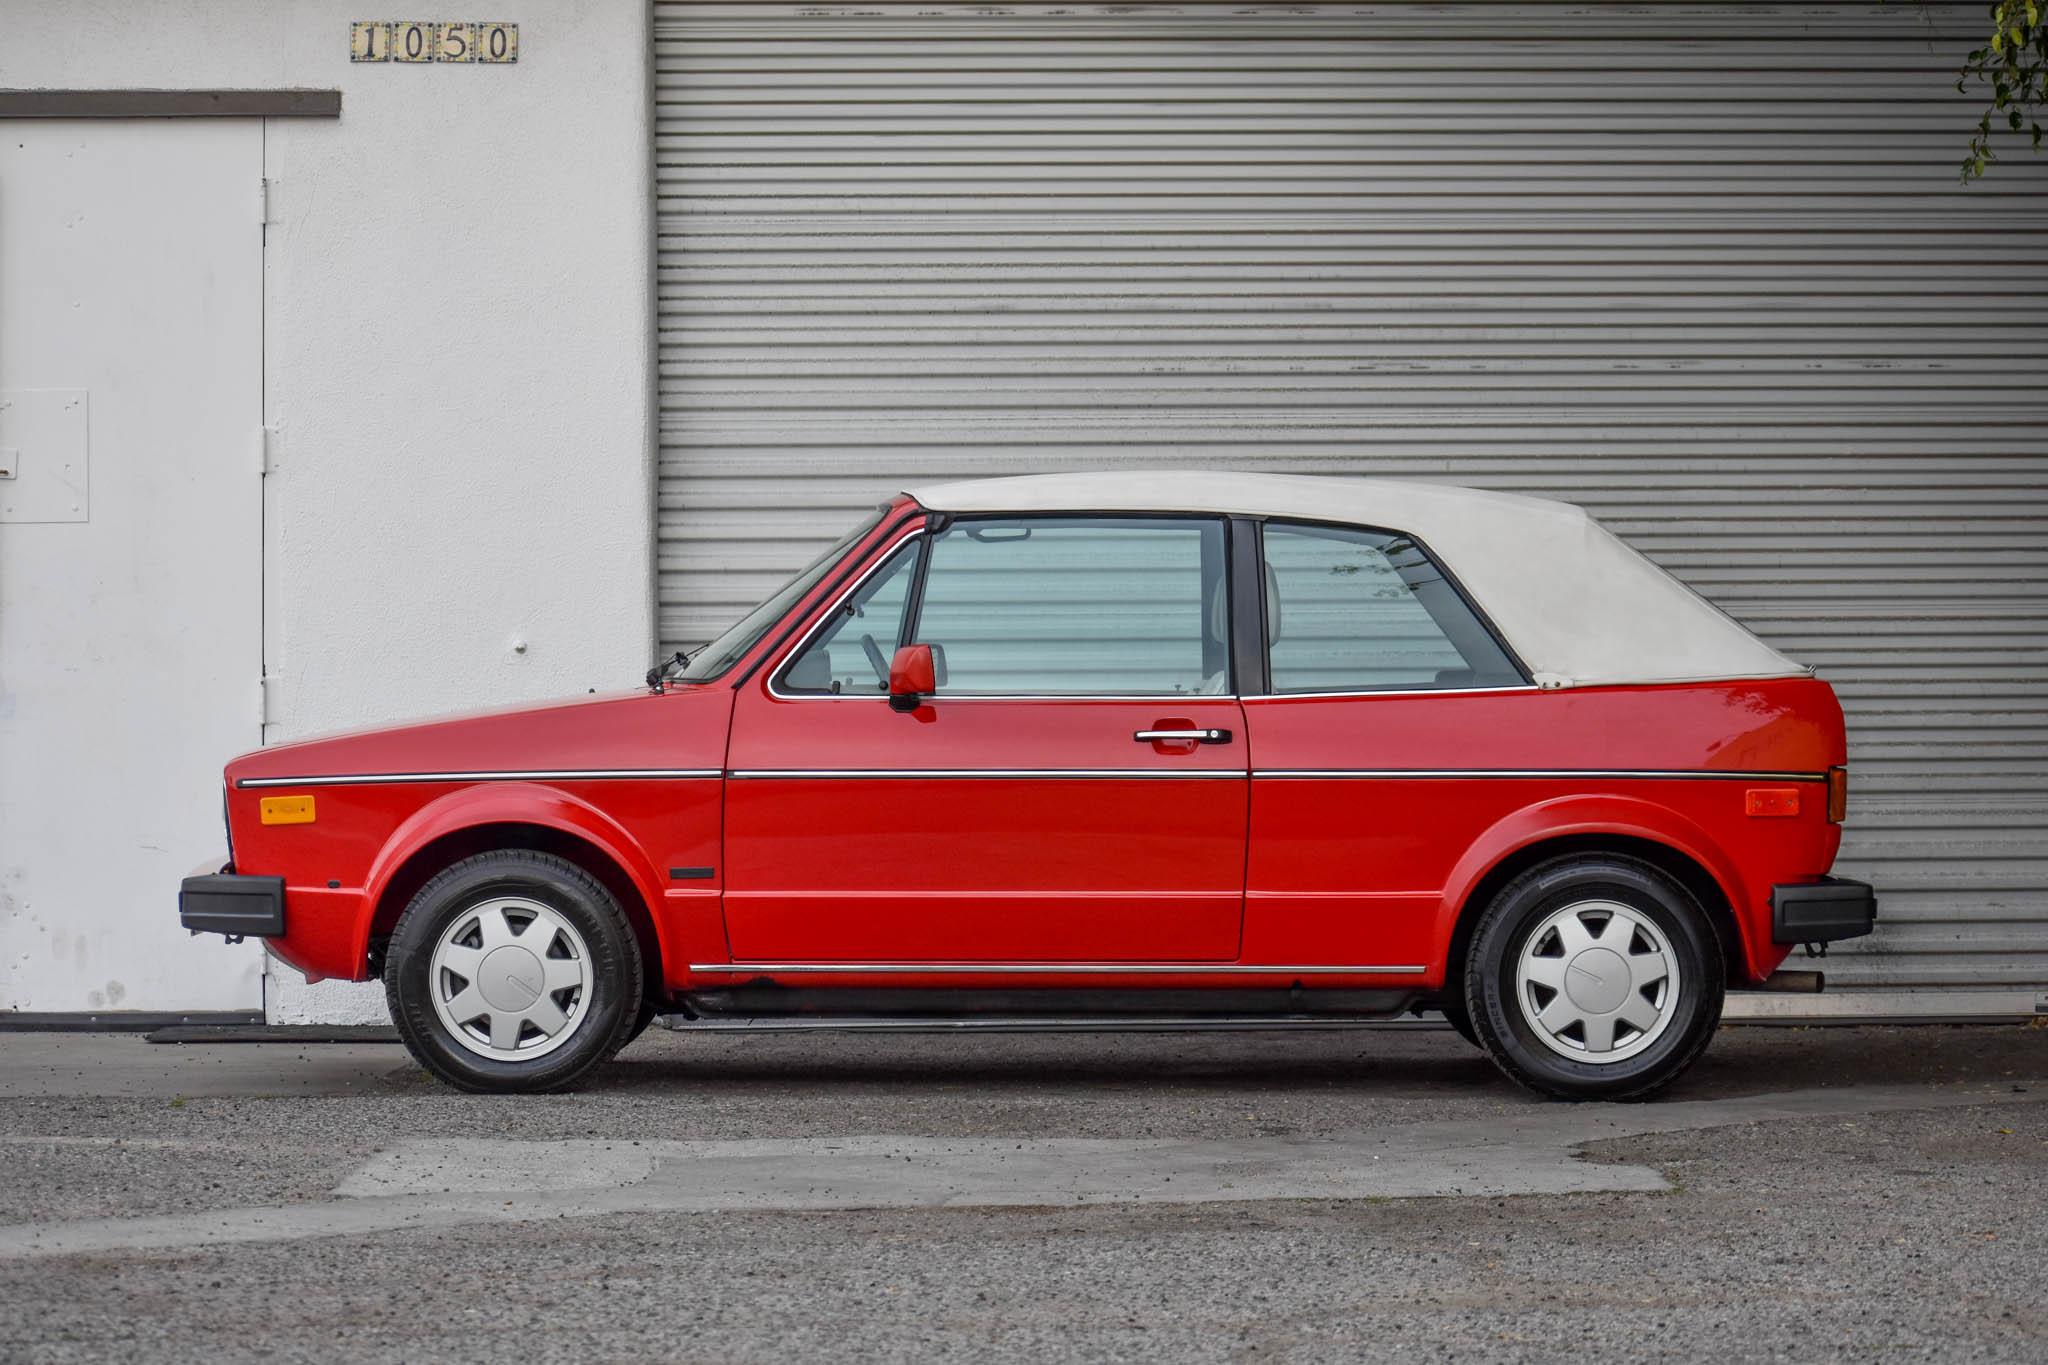 1987_volkswagen_cabriolet_1585809323e7dff9f98764daDSC_0132